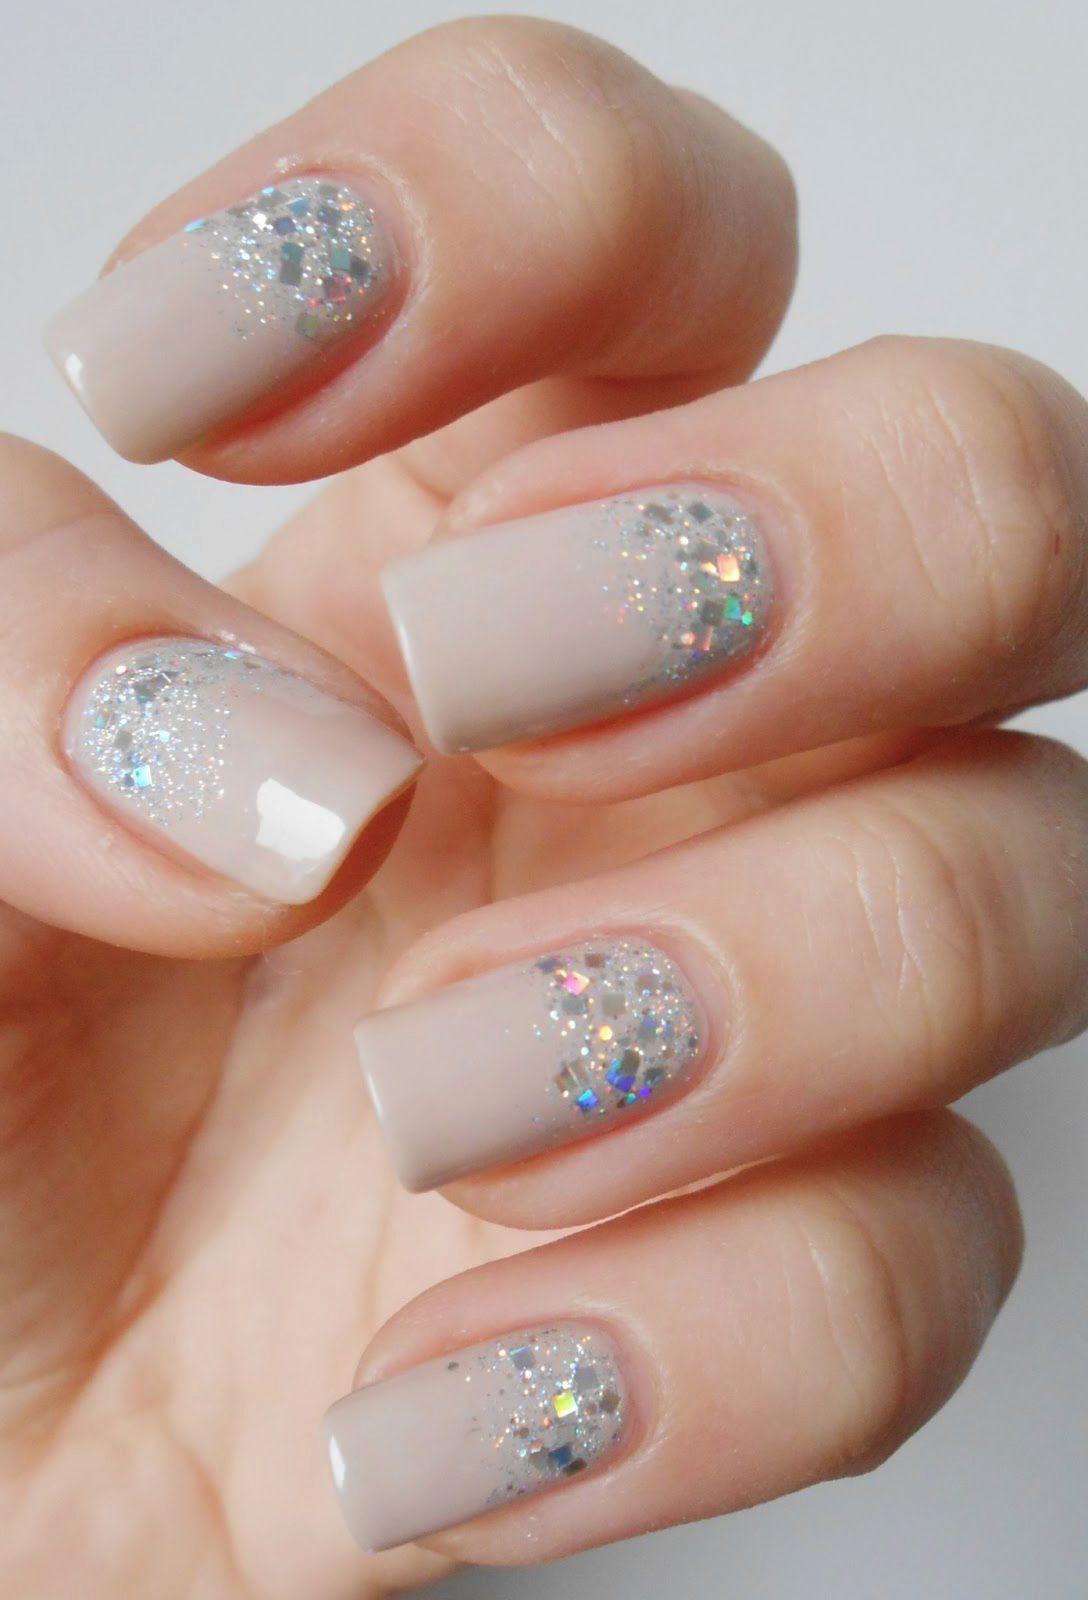 Unhas delicadas | Uñas decoradas, Manicura de uñas